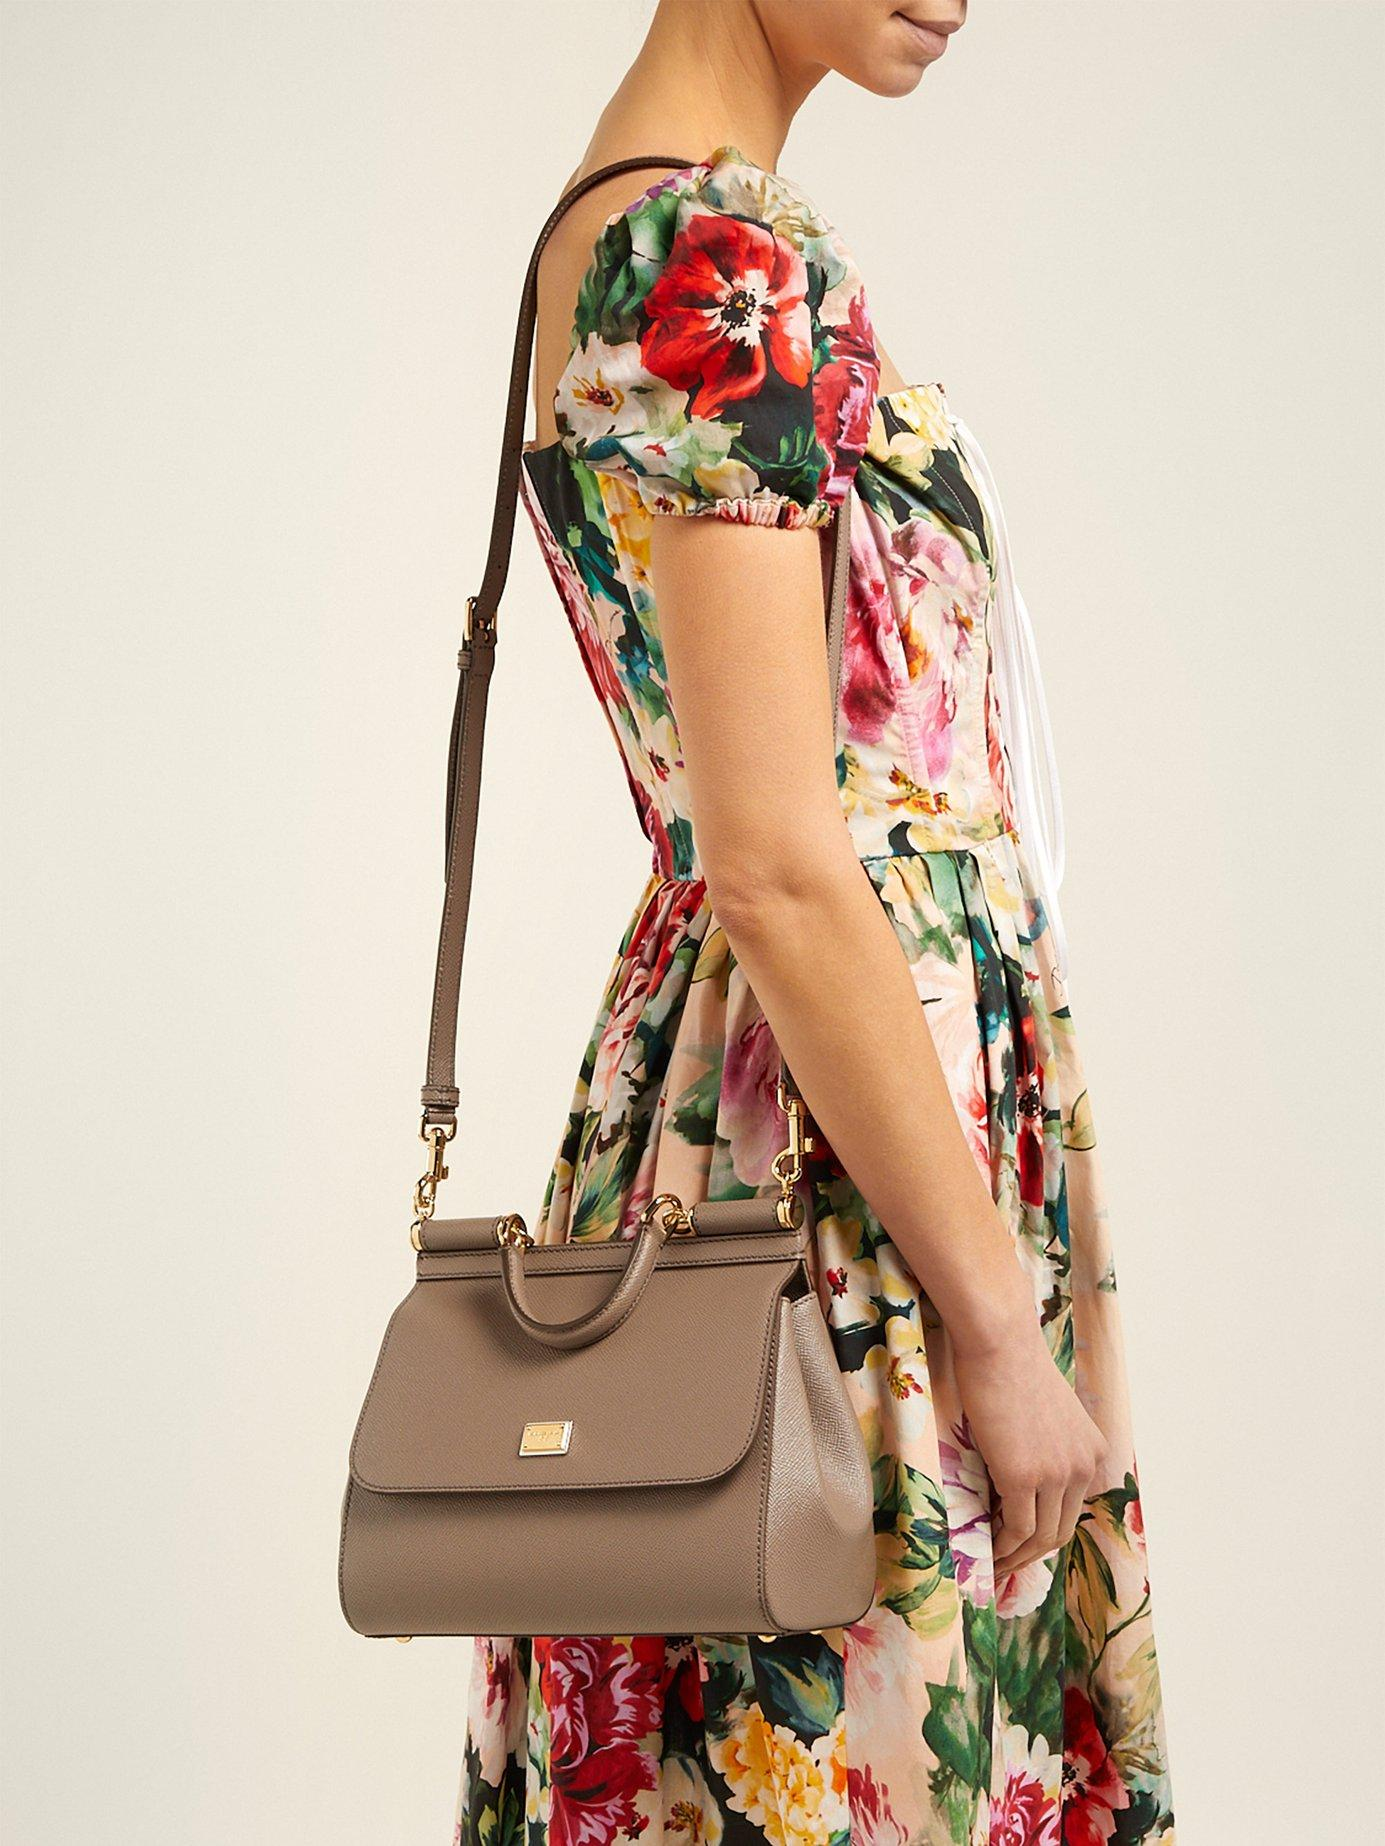 723c423f25 Lyst - Dolce   Gabbana Sicily Medium Dauphine Leather Bag in Gray